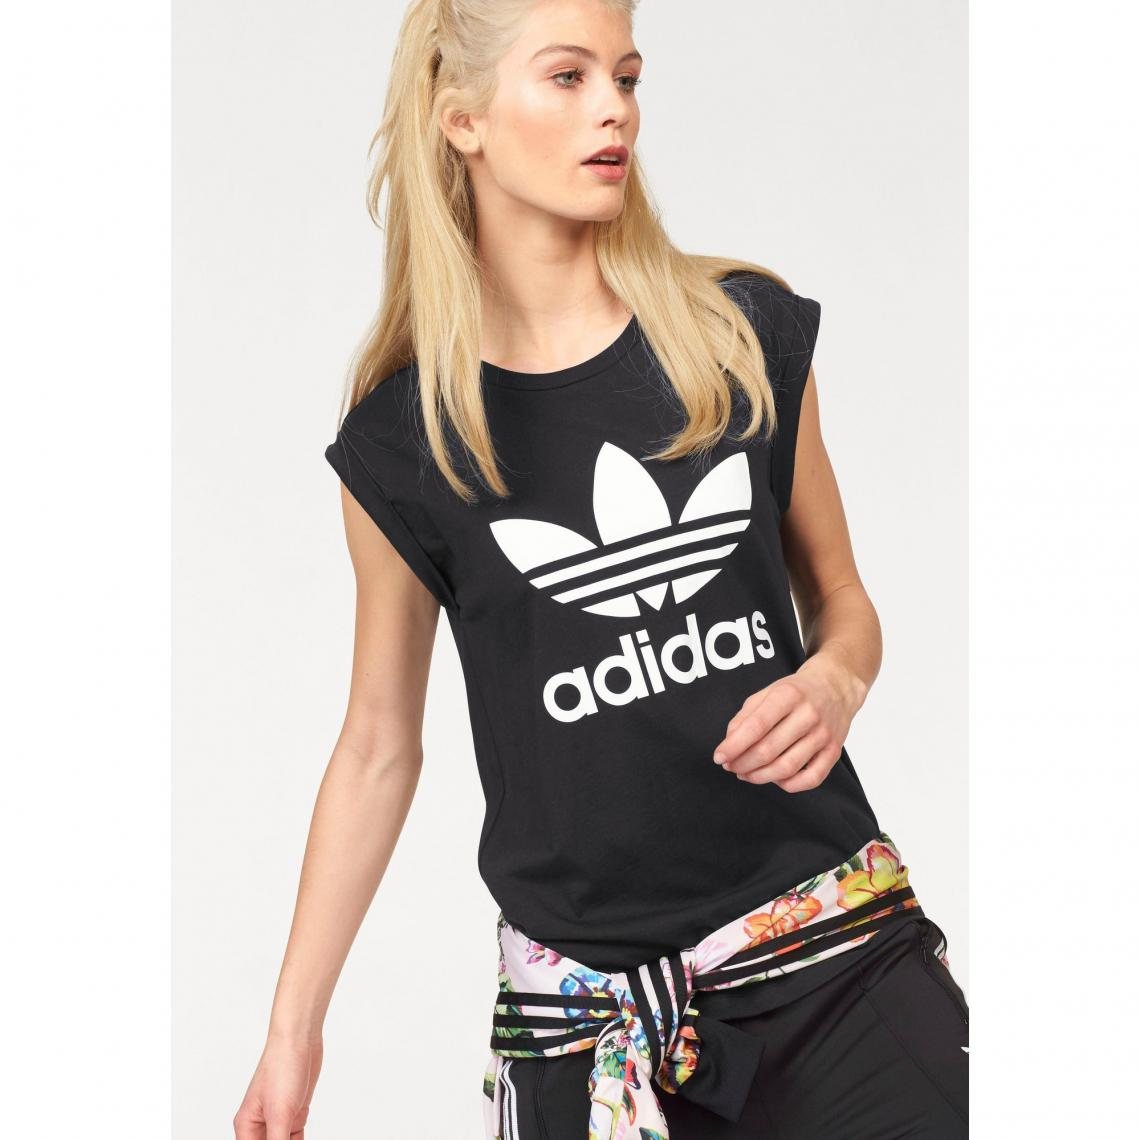 Tee-shirt femme Bf Trefoil Roll up Tee adidas Originals - Noir Adidas  Originals Femme 2d06b1b80f9